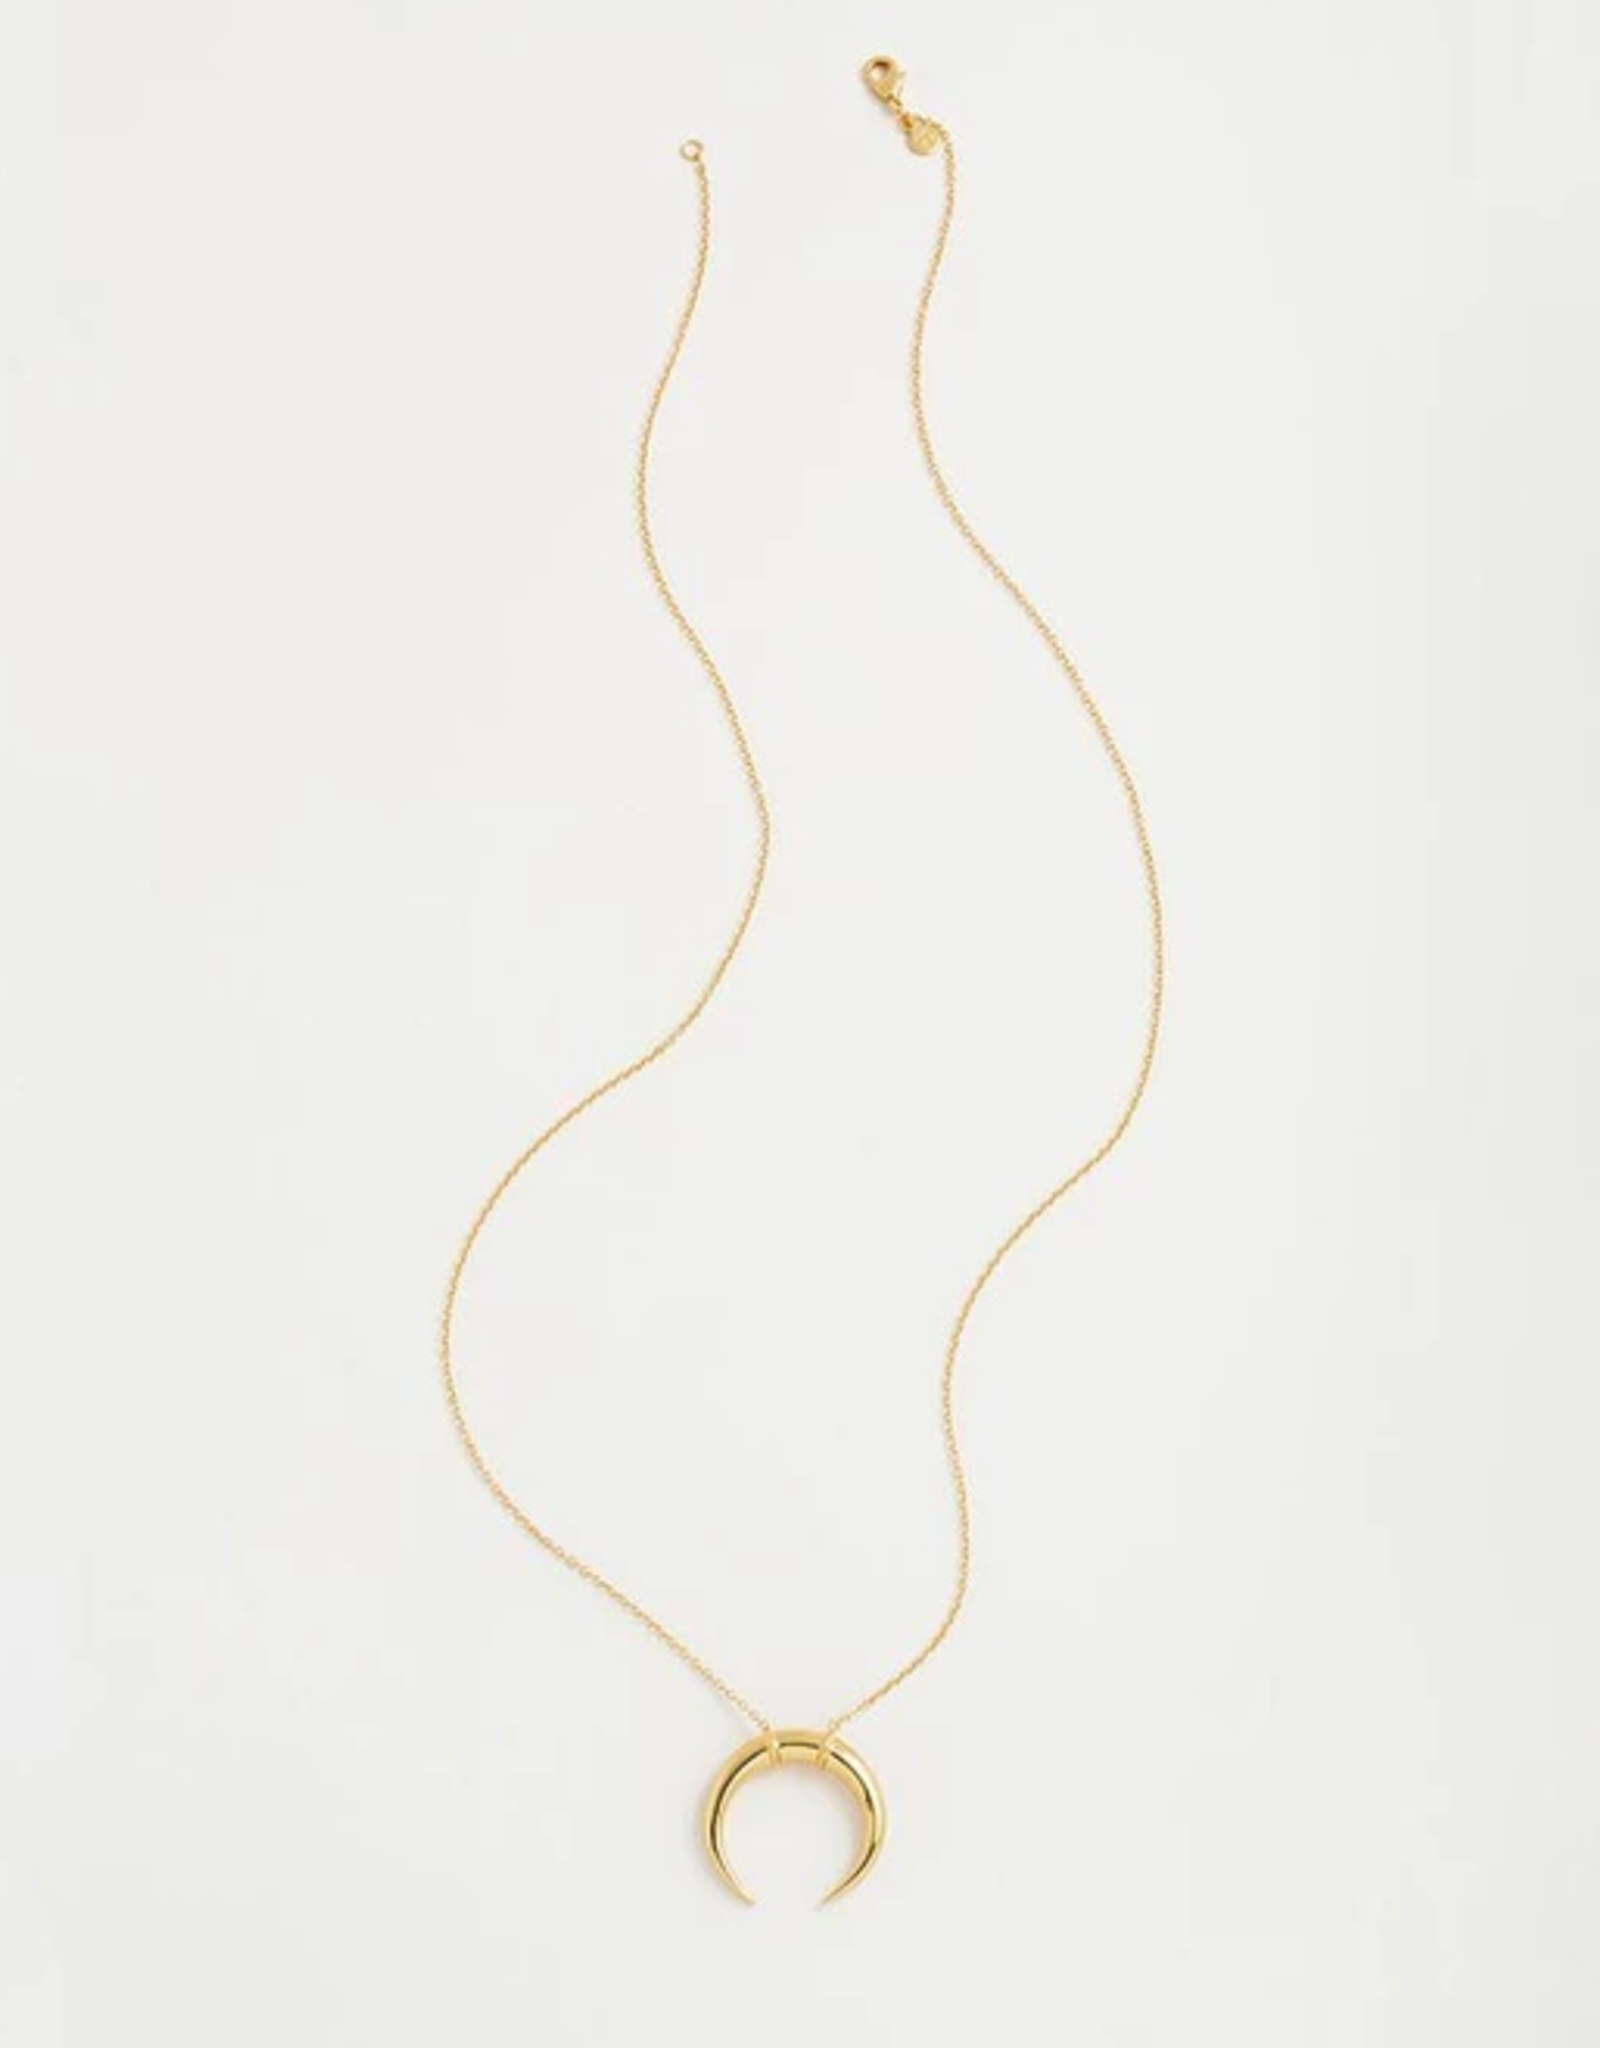 Website Cayne Crescent Pendant Necklace - gold